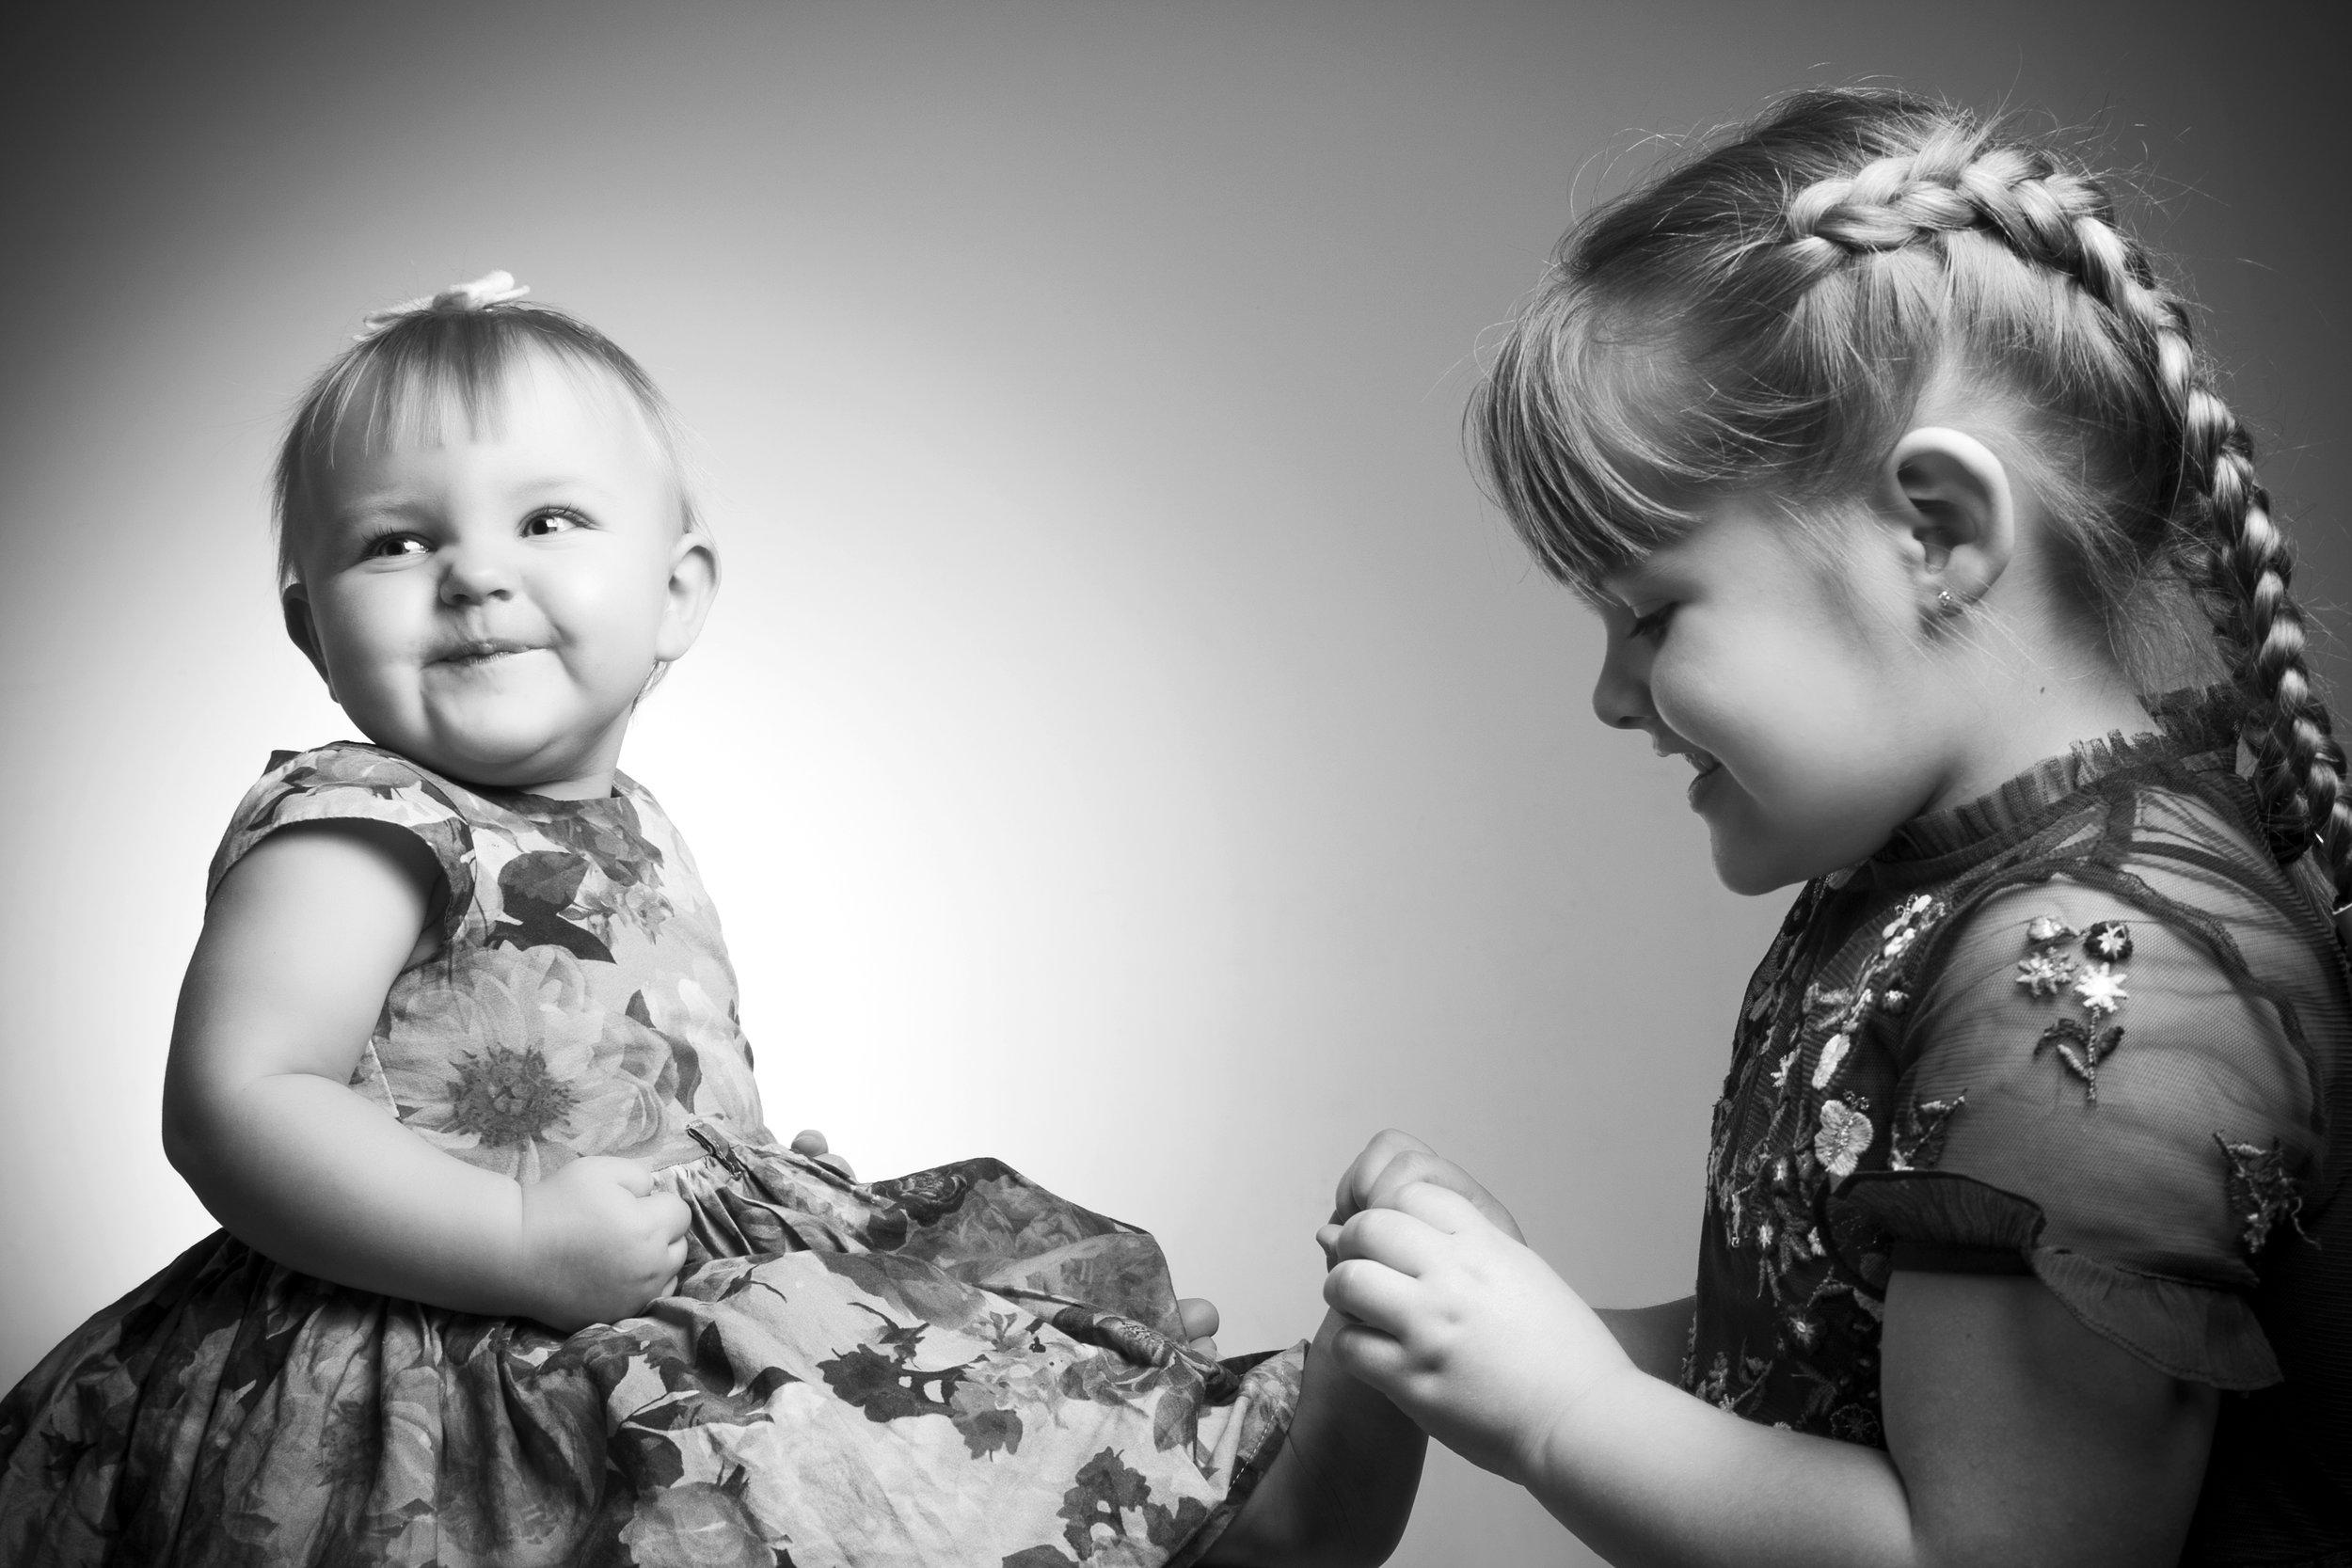 zigzag-photography-leicester-zig-zag-photographers-photo-studio-clarendon-park-queens-road-best-family-portraits-children.jpg